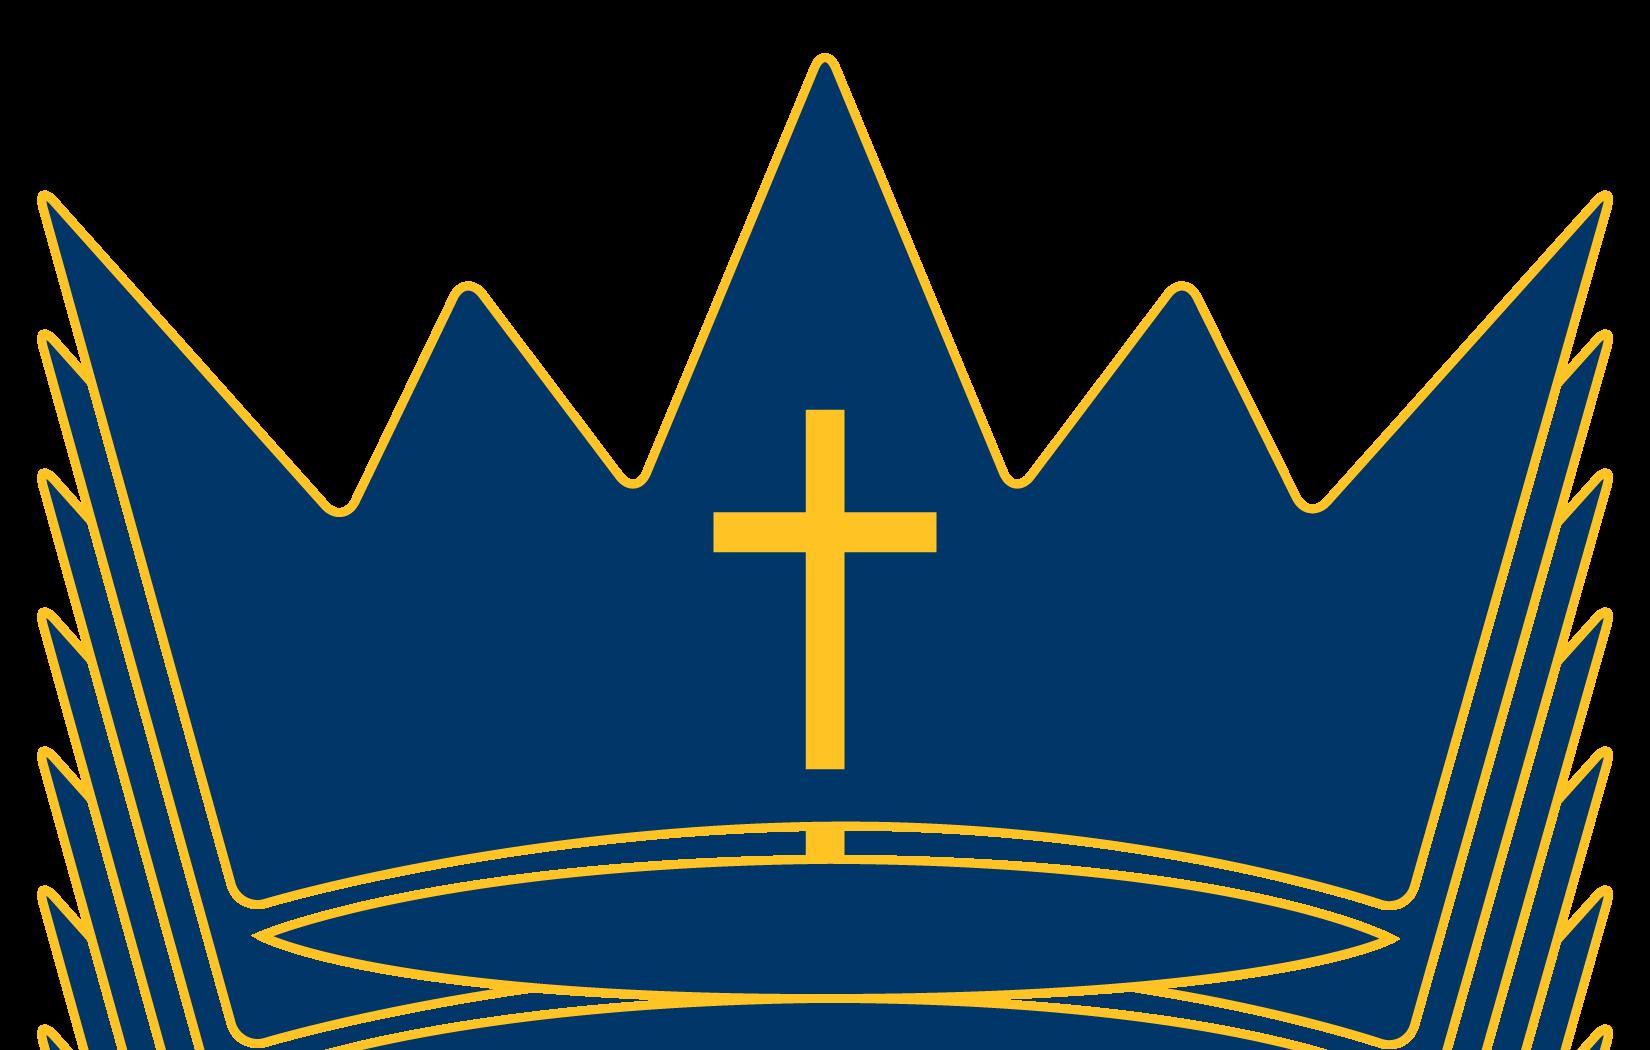 Blue crown Logos - photo#34